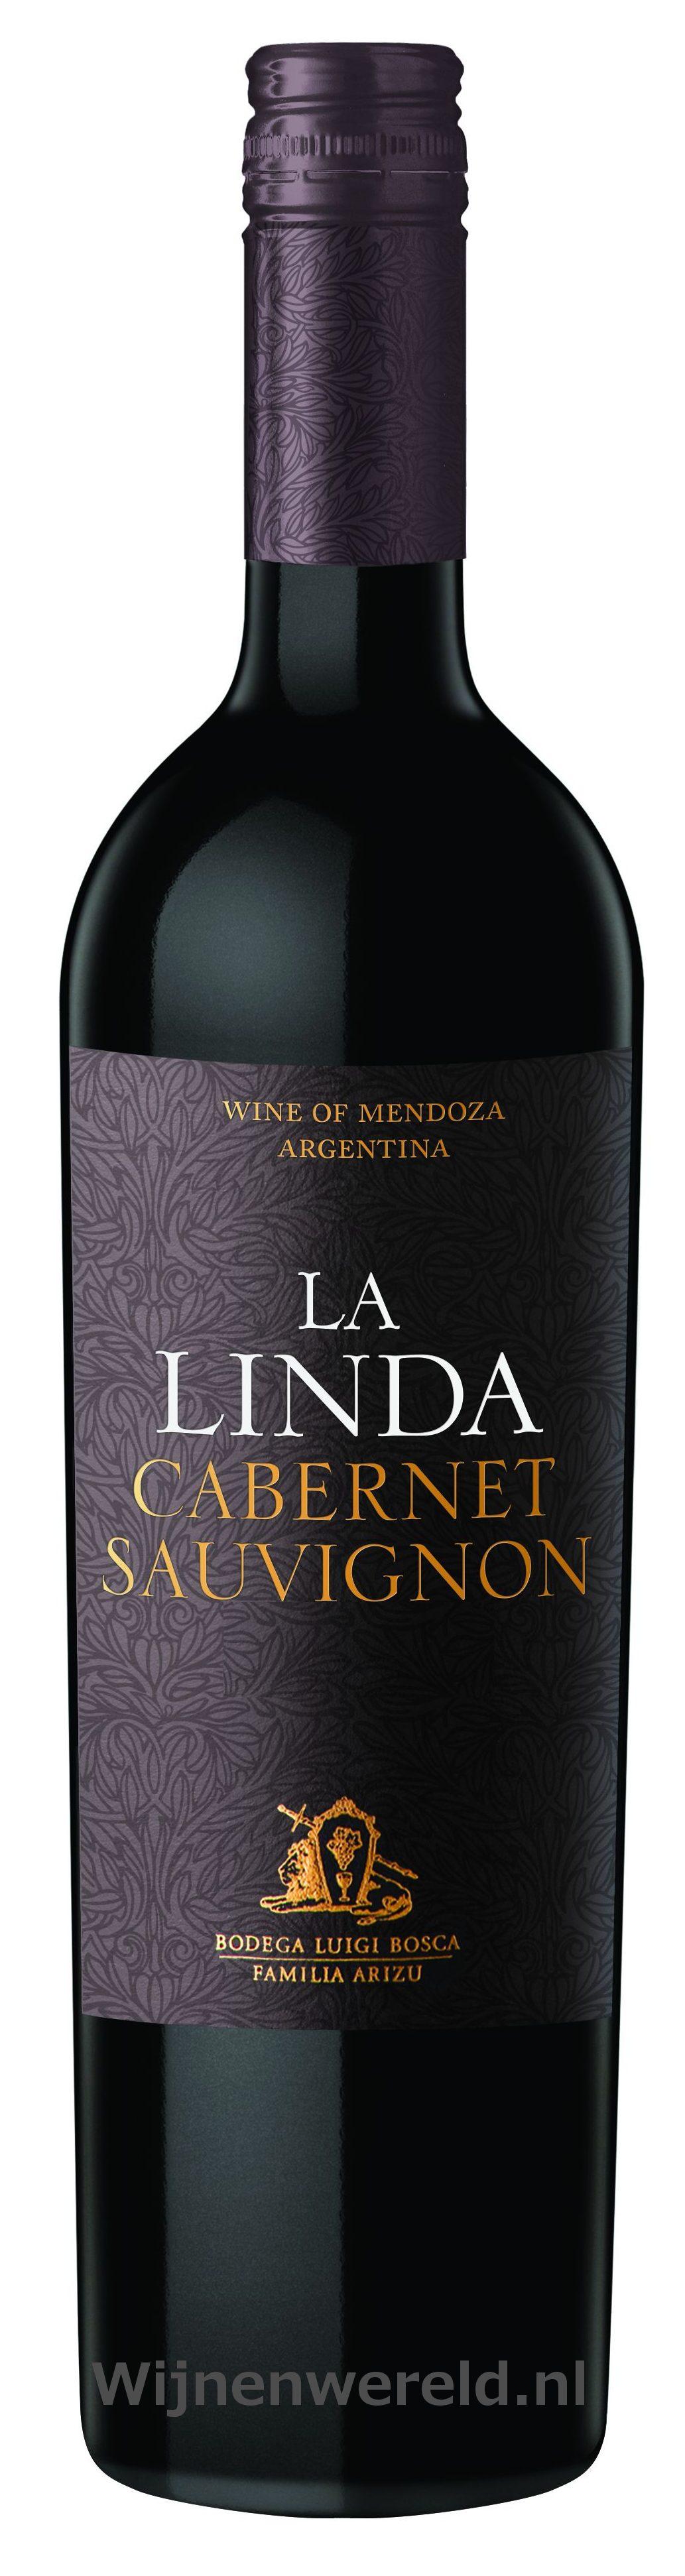 la linda cabernet sauvignon wijnenwereld